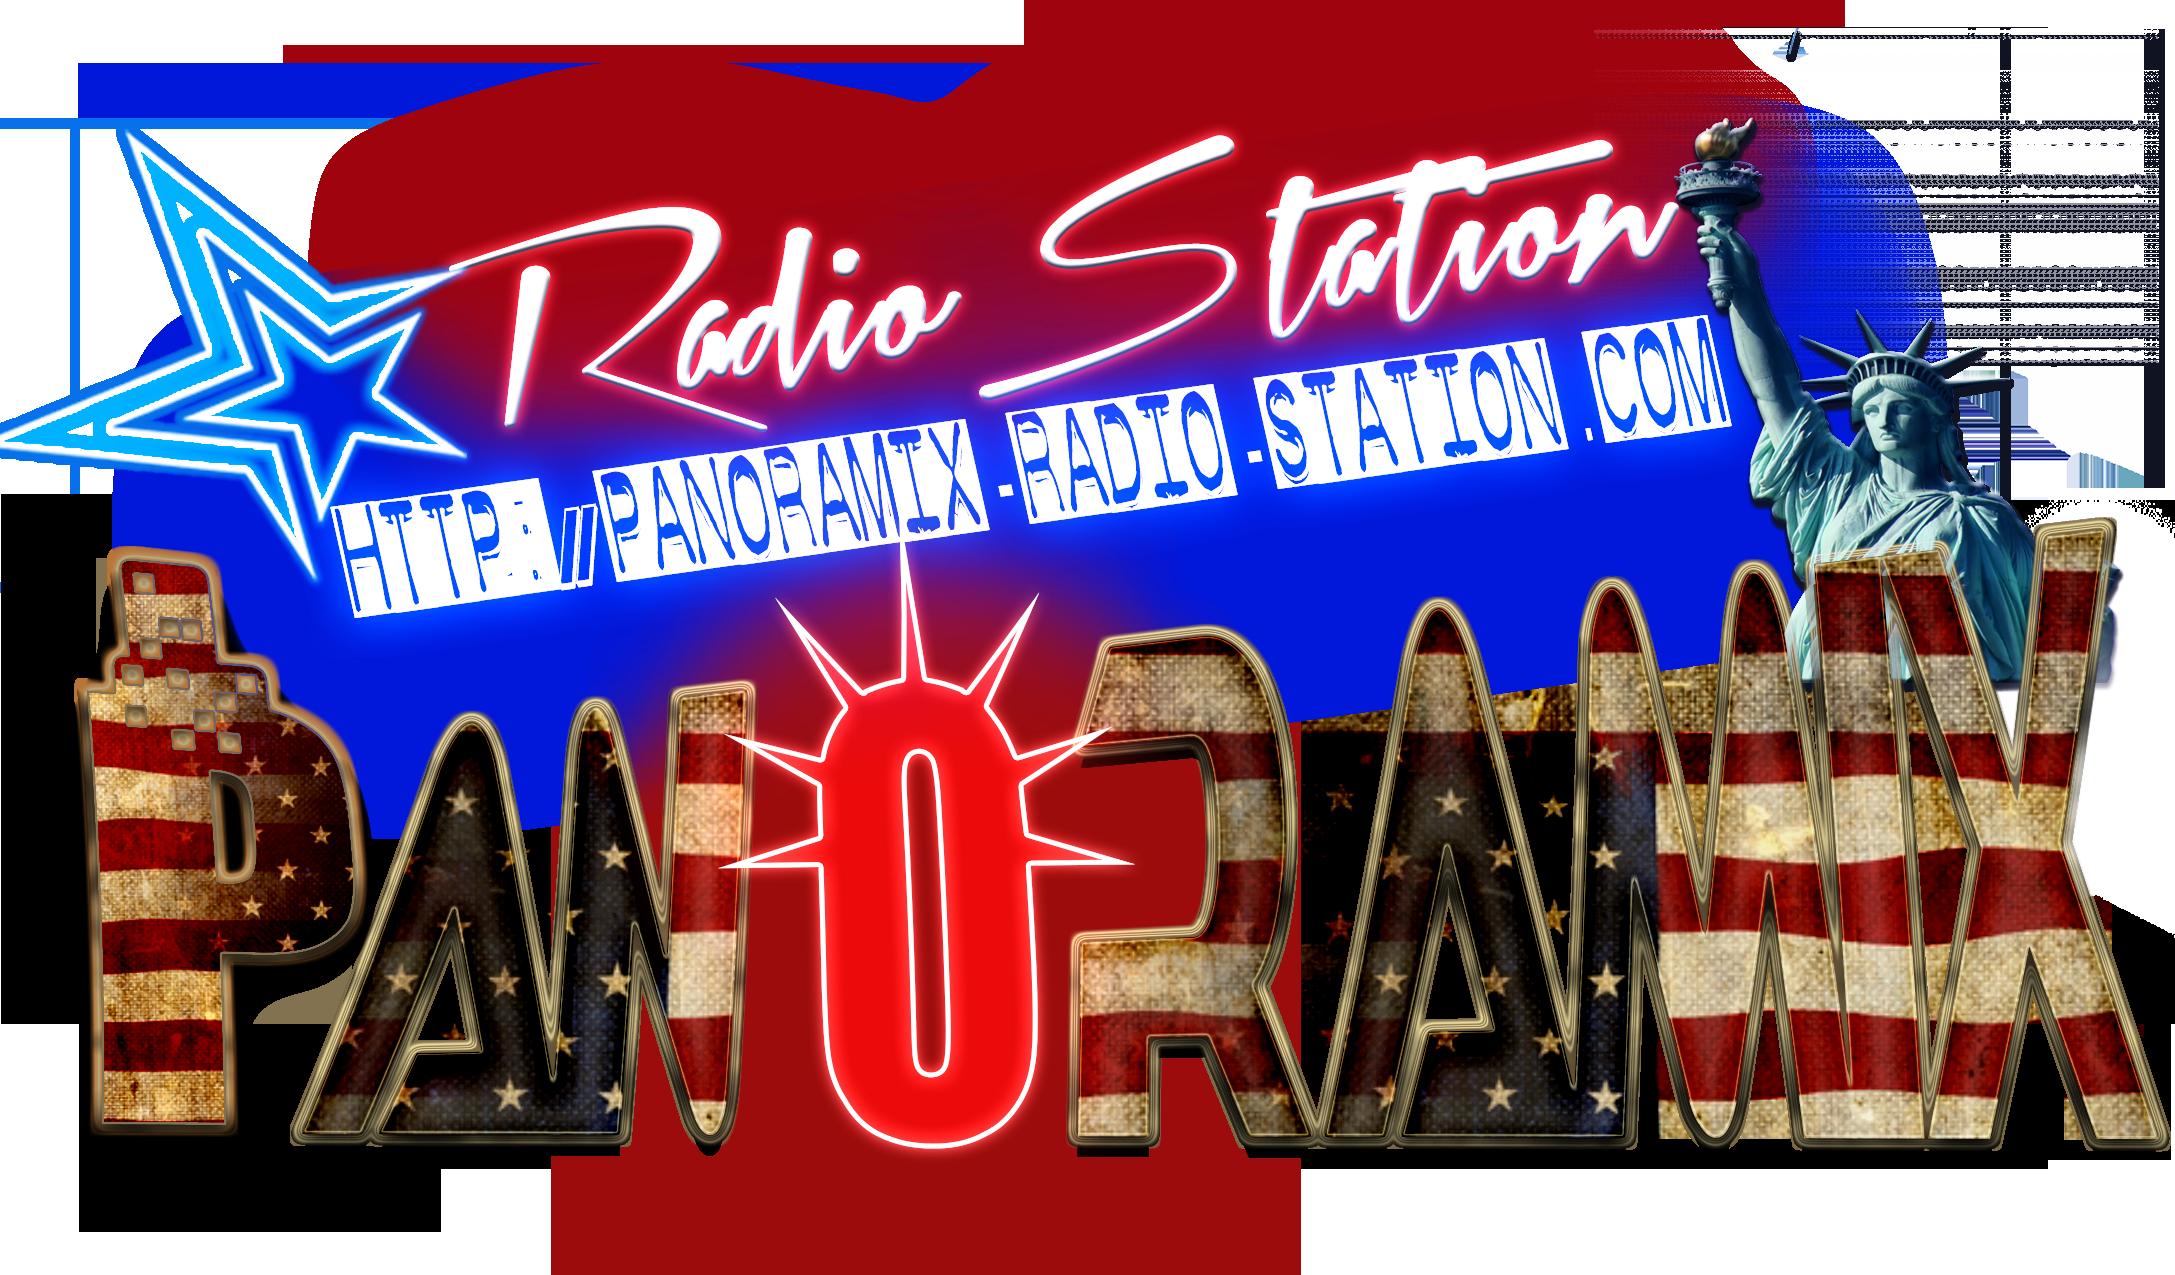 http://panoramix-radio-station.com/wp-content/uploads/2018/04/LOGO-PANORAMIX-RADIO-2-2018-SANS-FOND-GRAND-FORMAT-.png